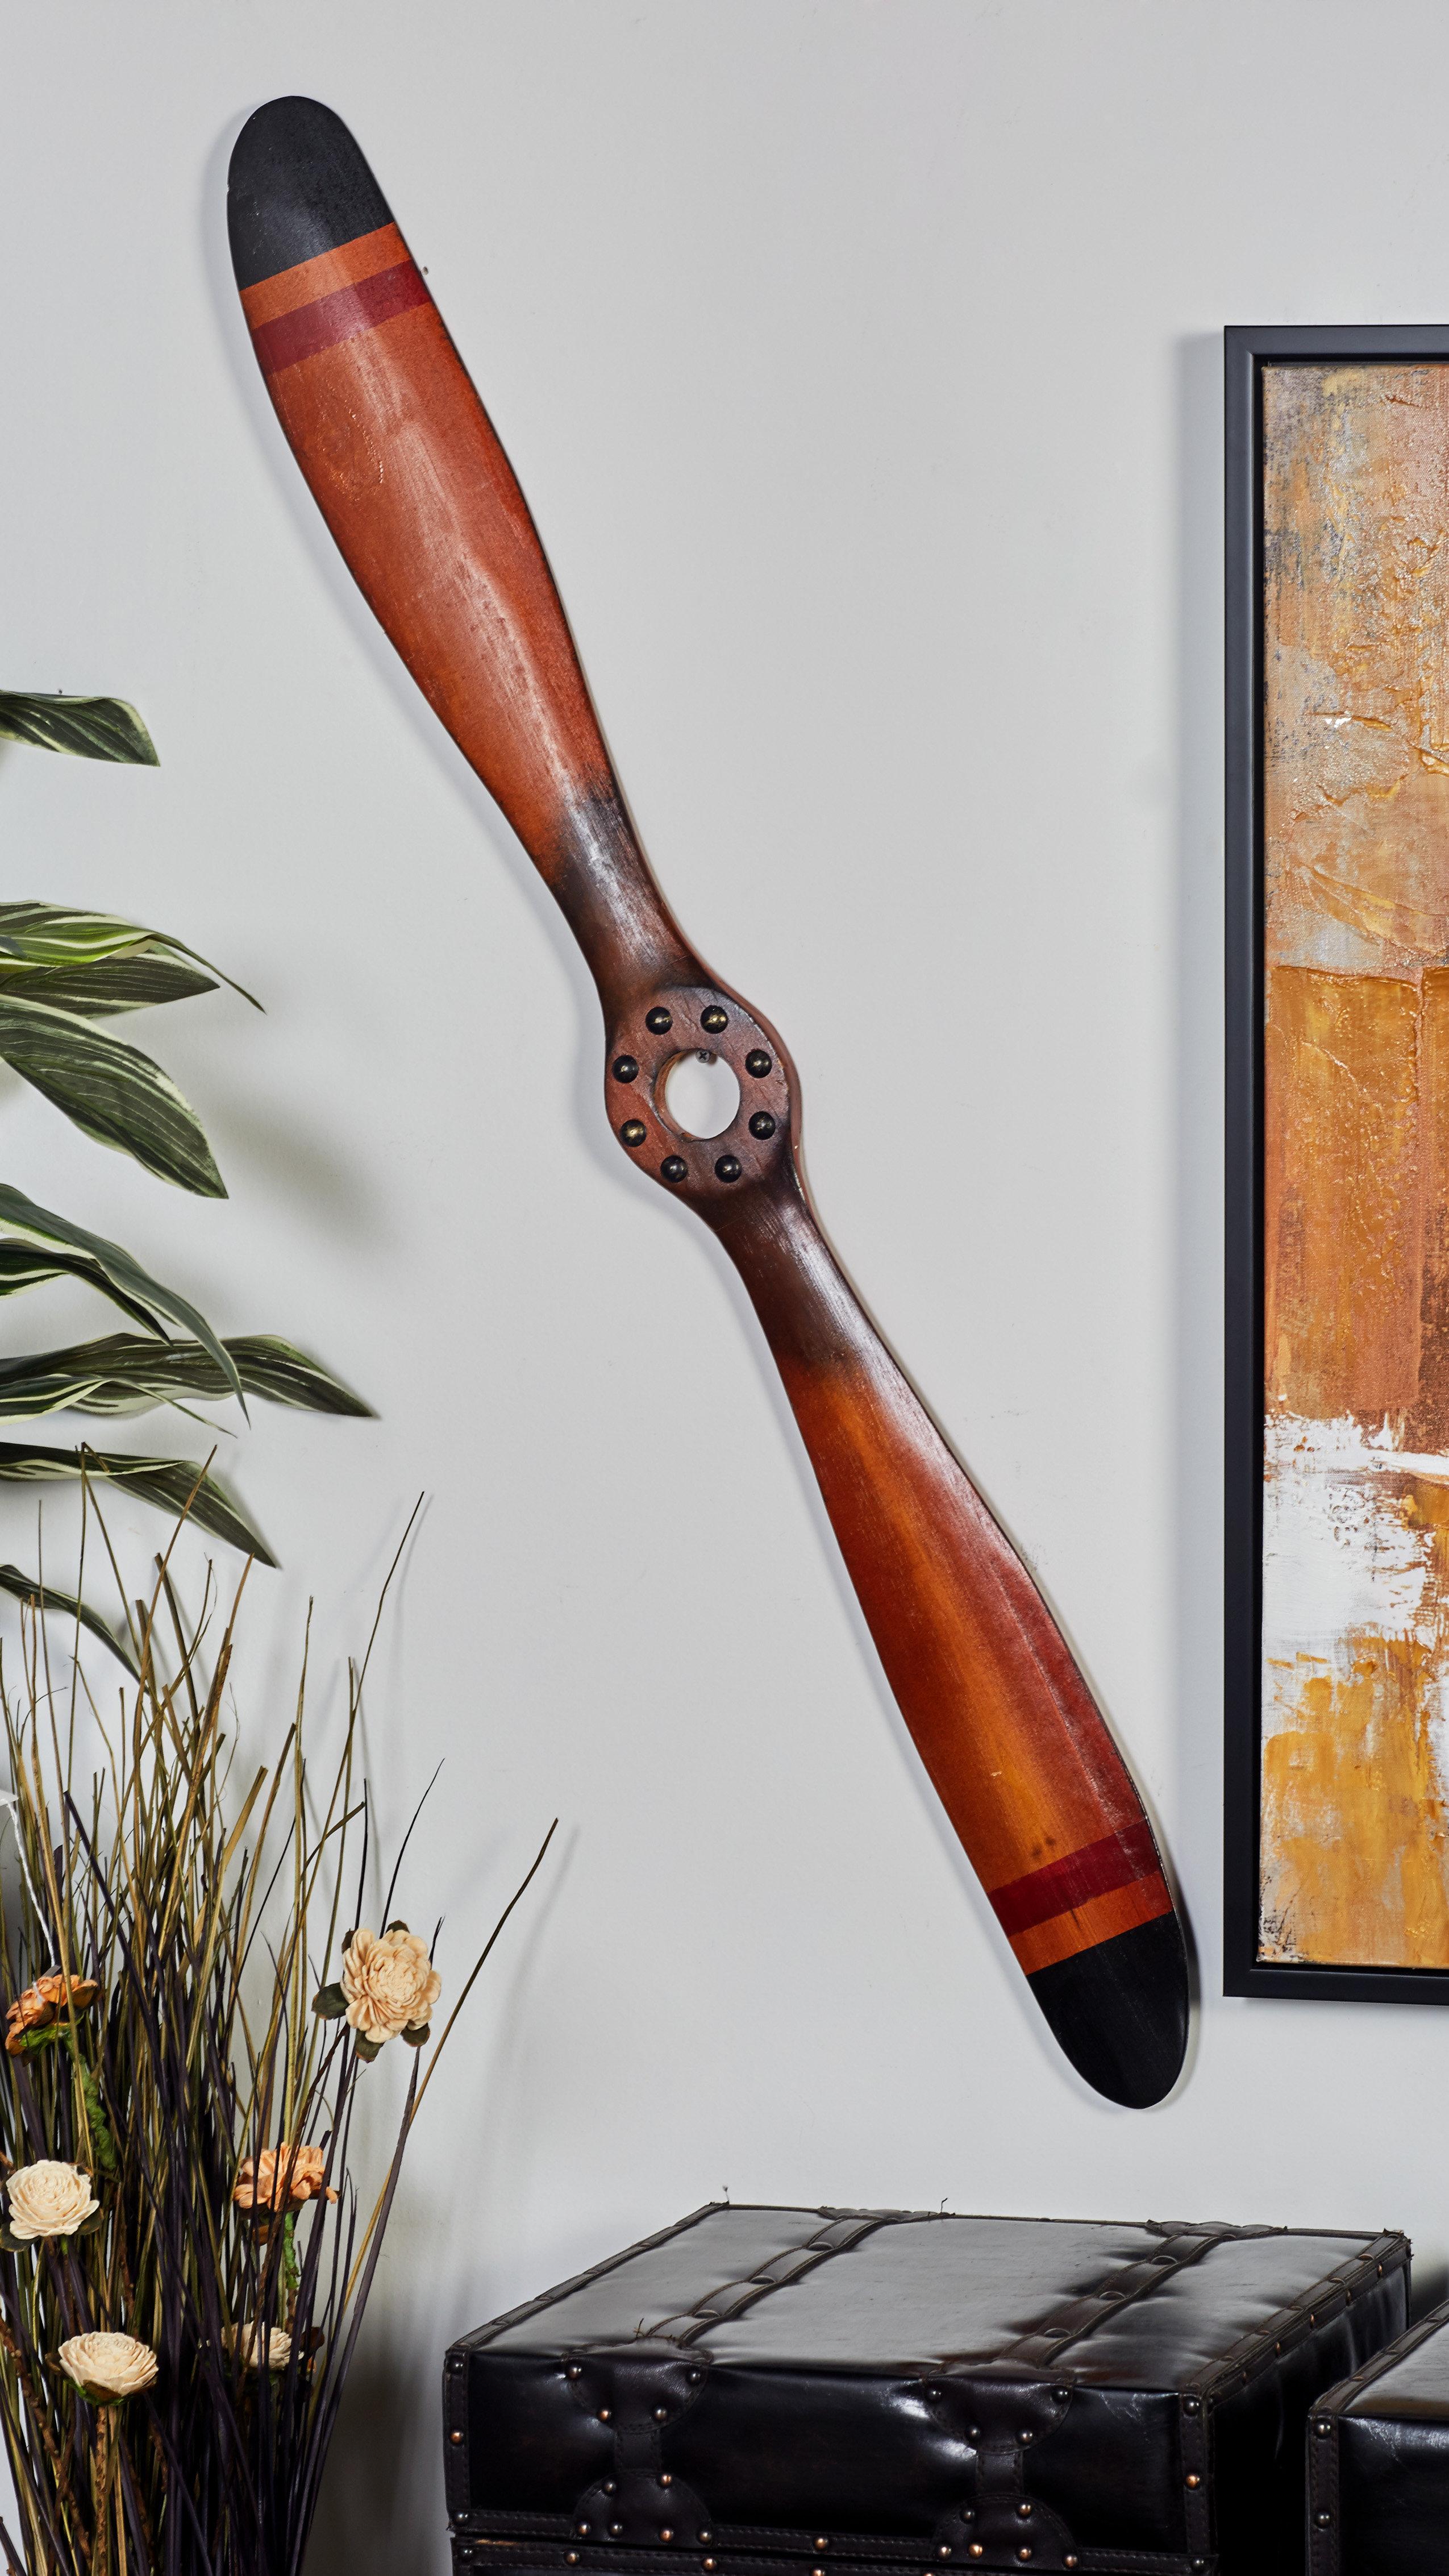 Decorative Wood Airplane Propeller Model Wall Decor Reviews Birch Lane